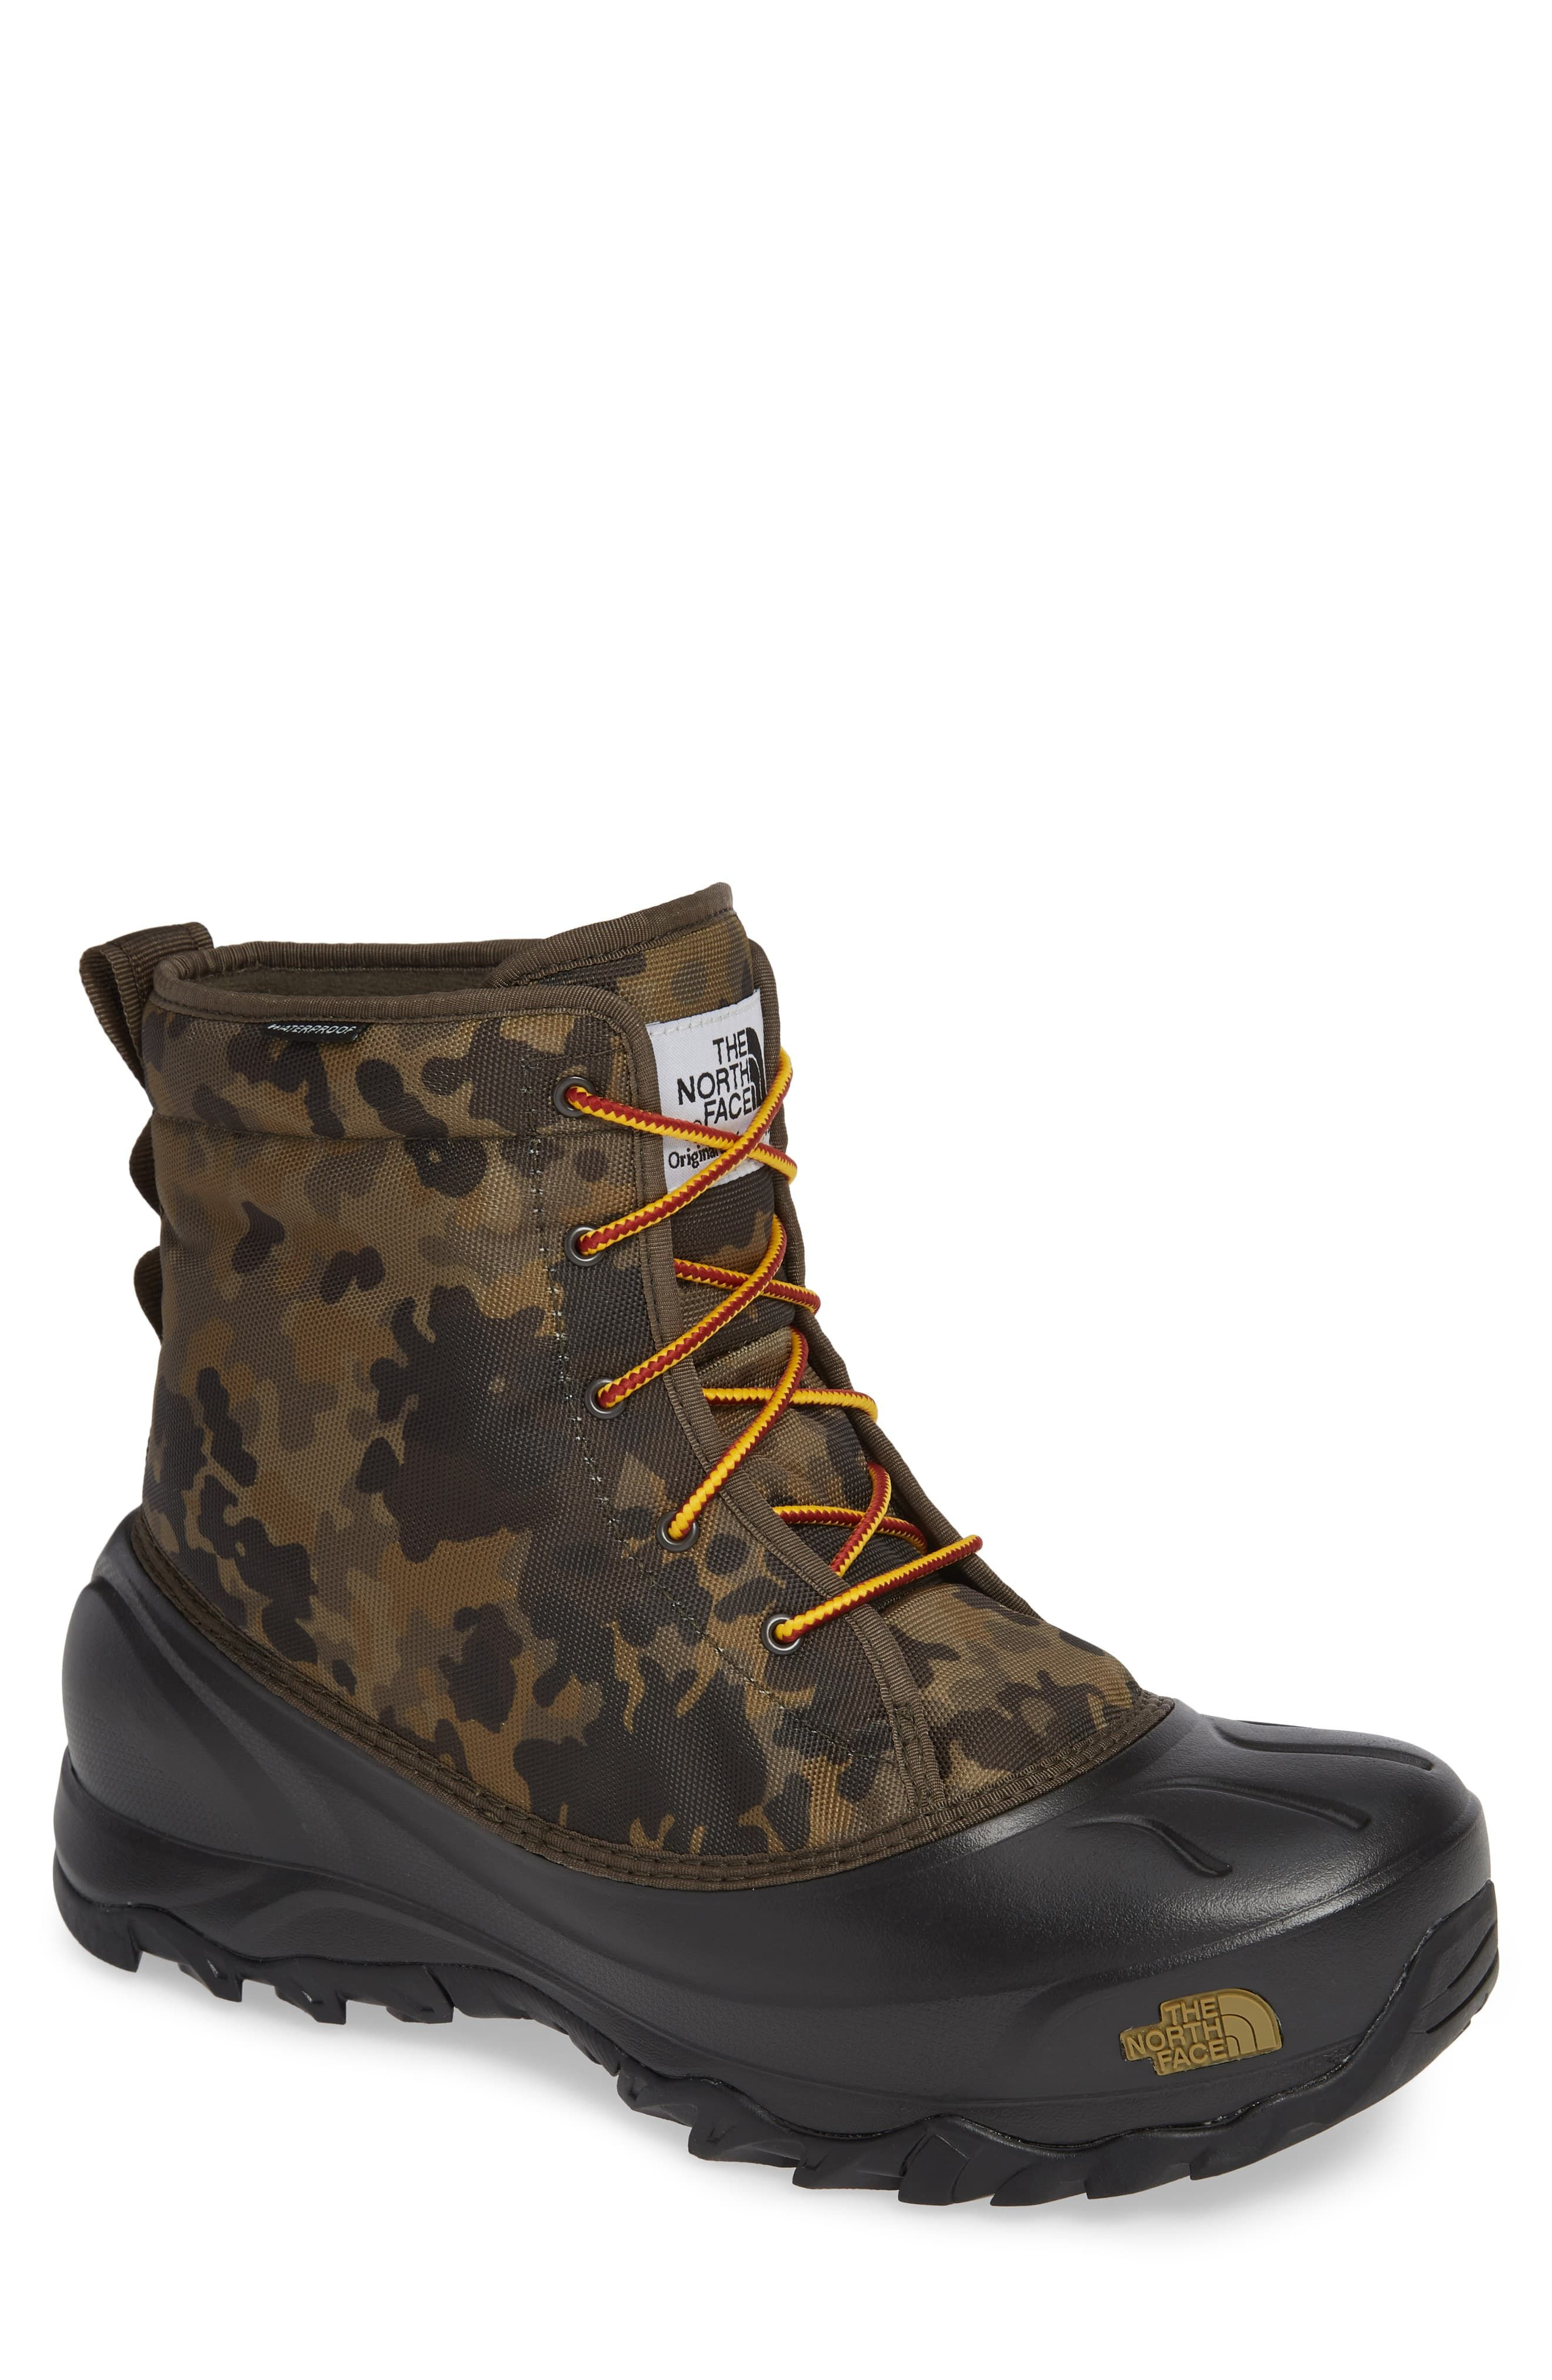 83d715e49cf Men's The North Face Tsumoru Snow Waterproof Boot, Size 11.5 M ...